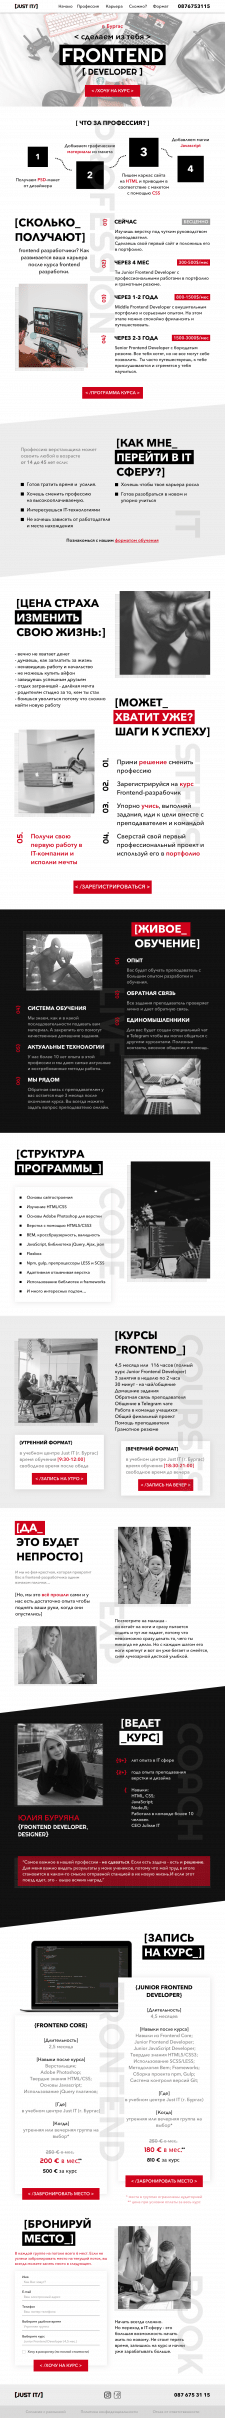 Just IT дизайн, концепция, тексты, верстка